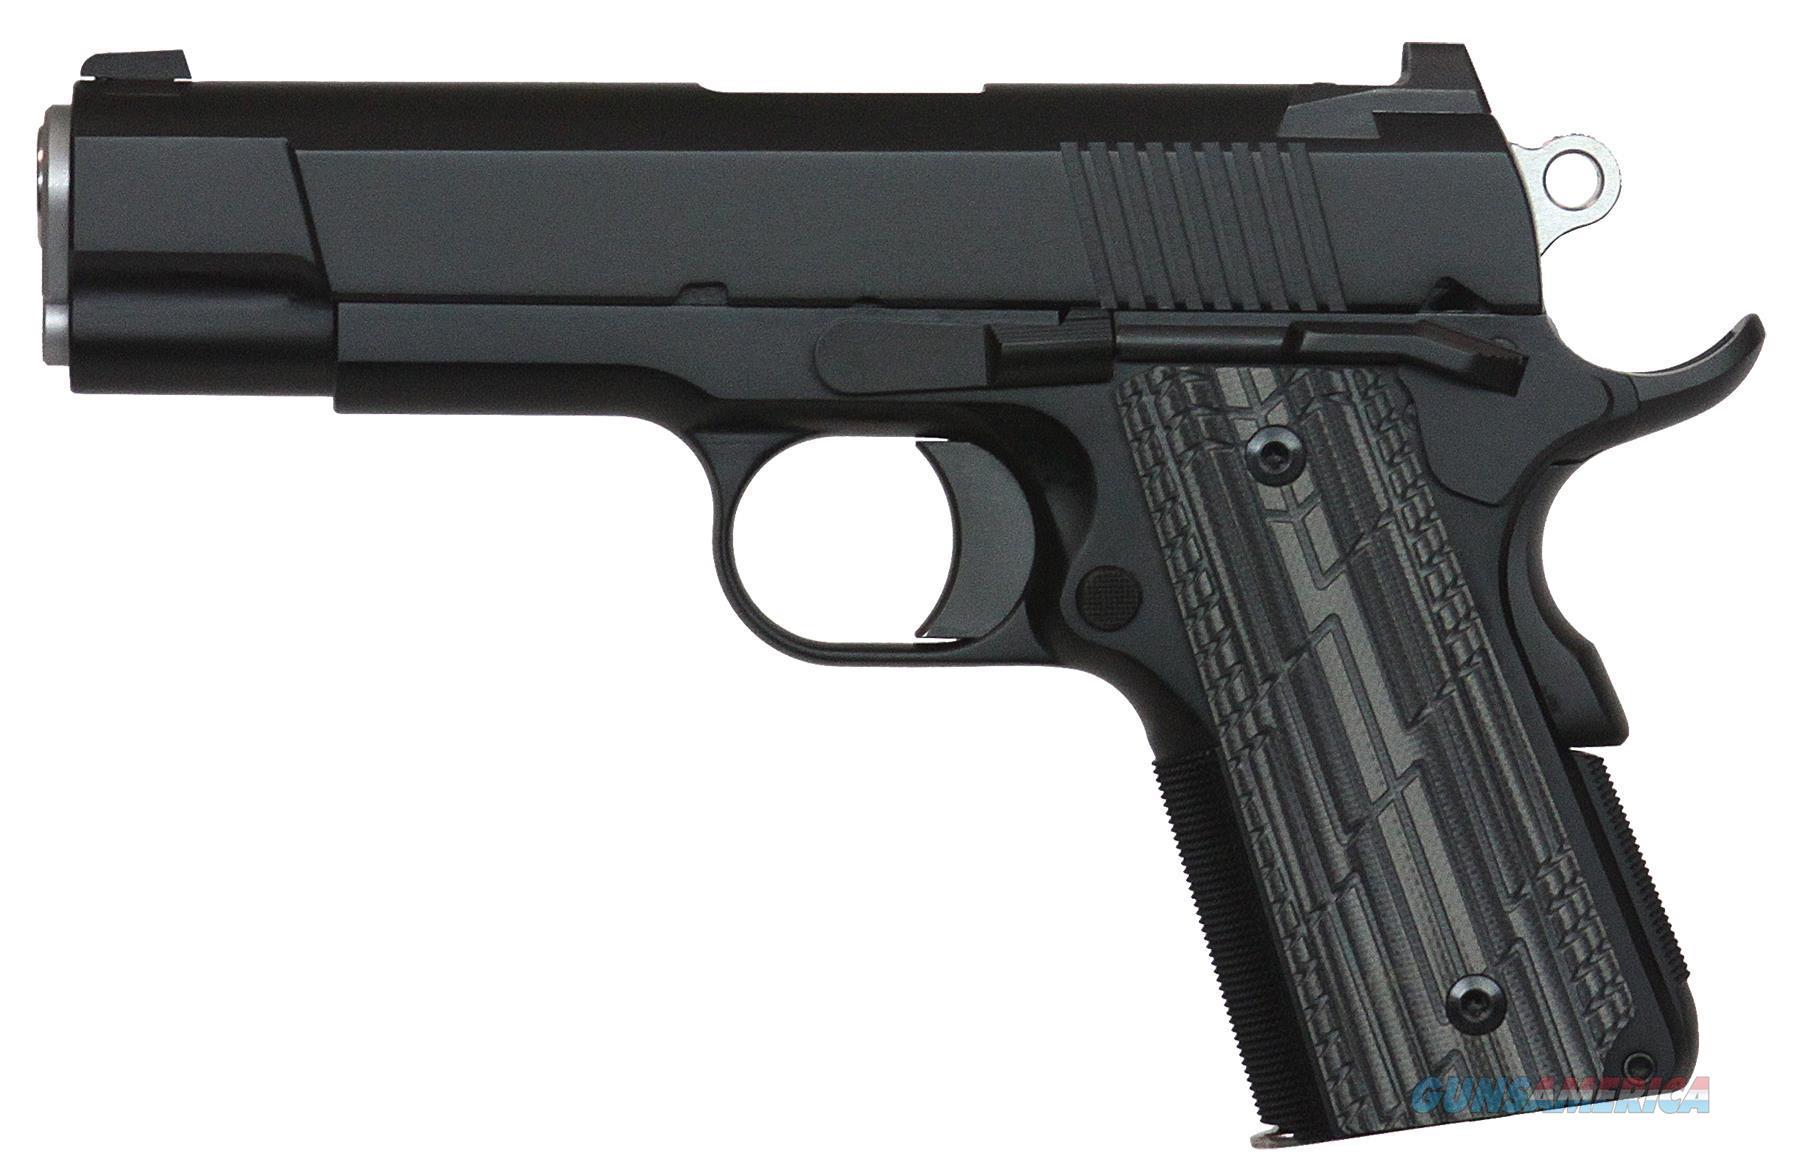 "Dan Wesson 01966 1911 Valkyrie Single 45 Automatic Colt Pistol (Acp) 4.25"" 7+1 Tns Black/Gray Slimline G10 Grip Black 01966  Guns > Pistols > C Misc Pistols"